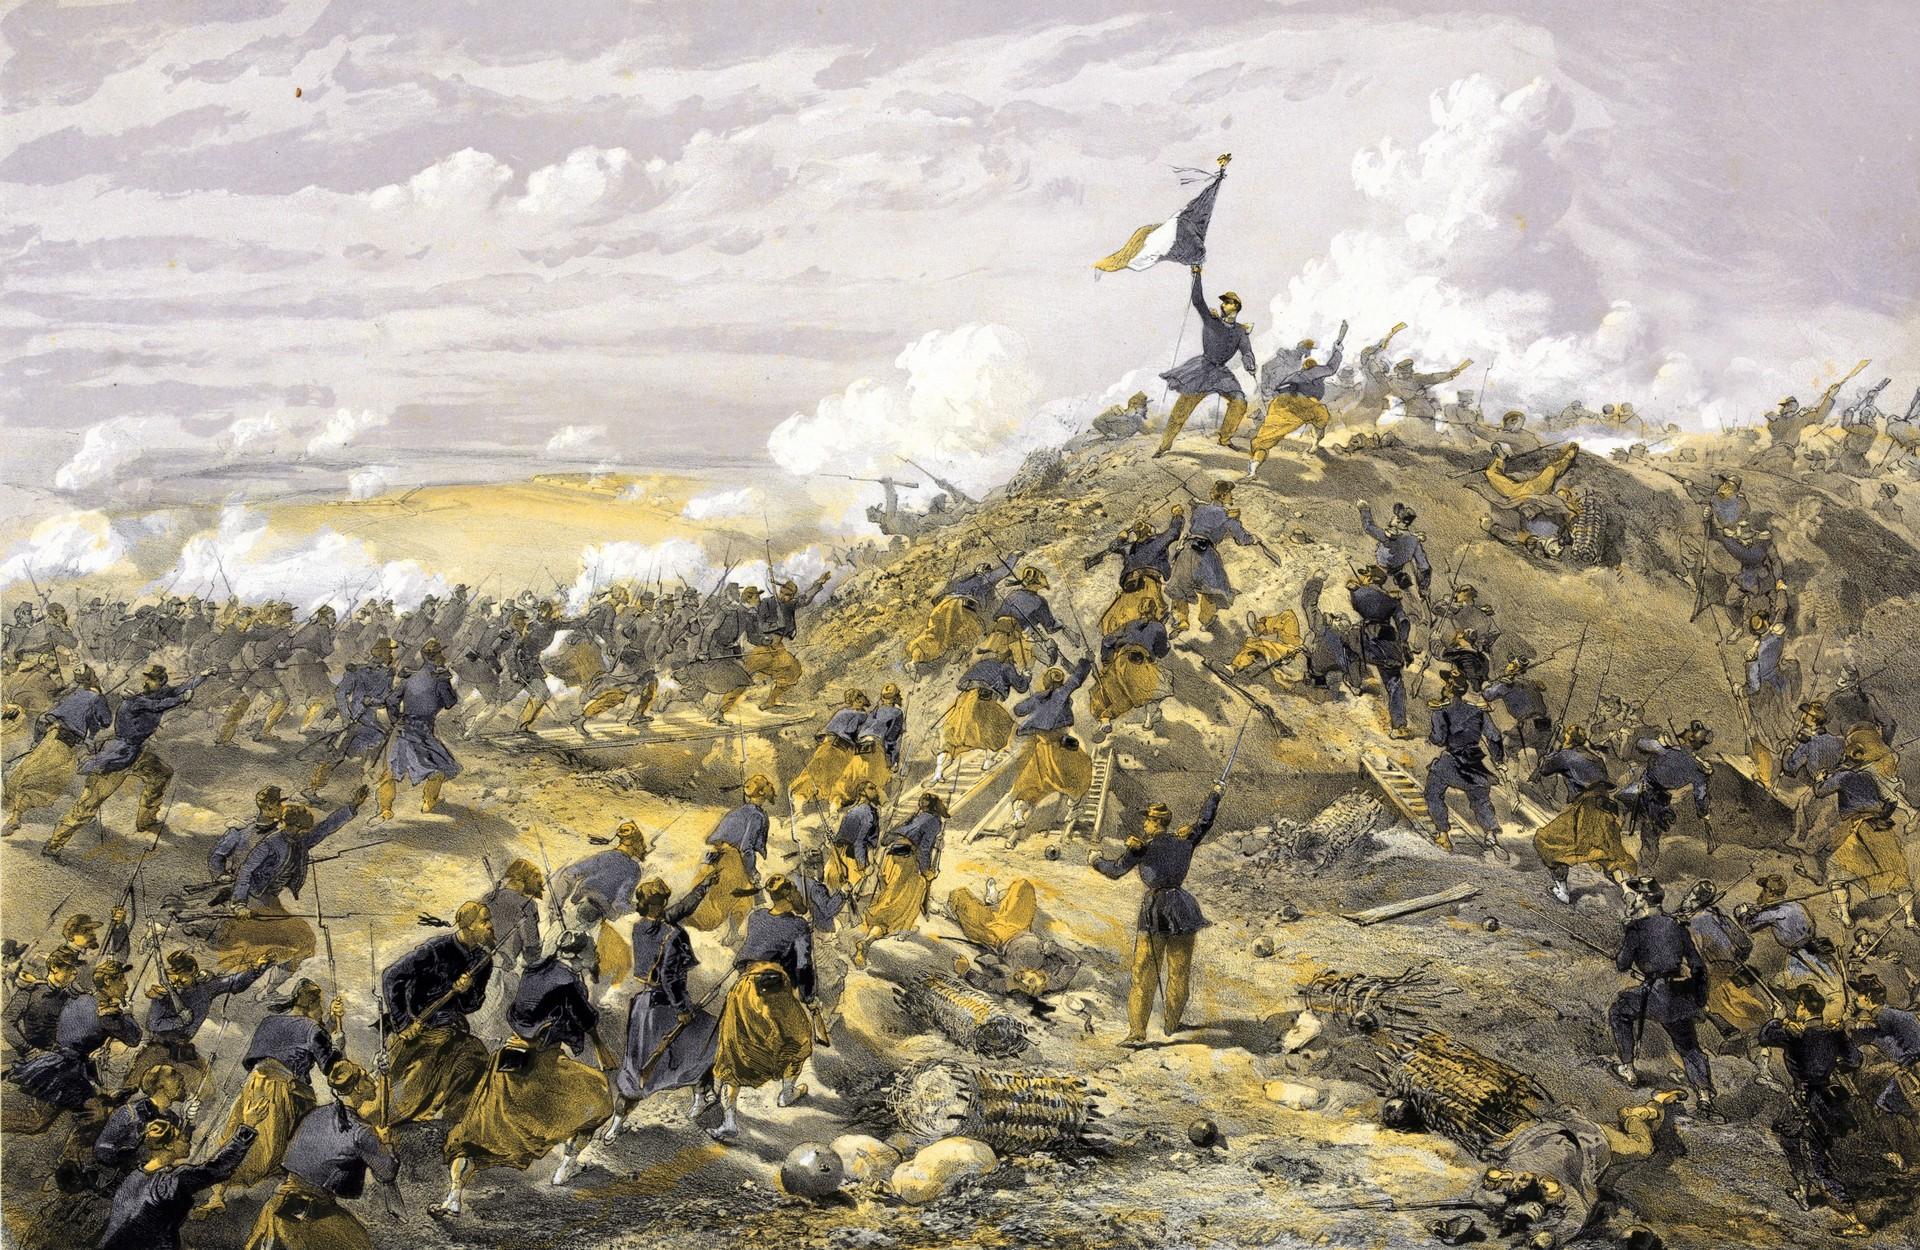 Francoski napad na rusko utrdbo Malakof pred Sevastopolom. V ospredju francoski borci zuavi iz severne Afrike.